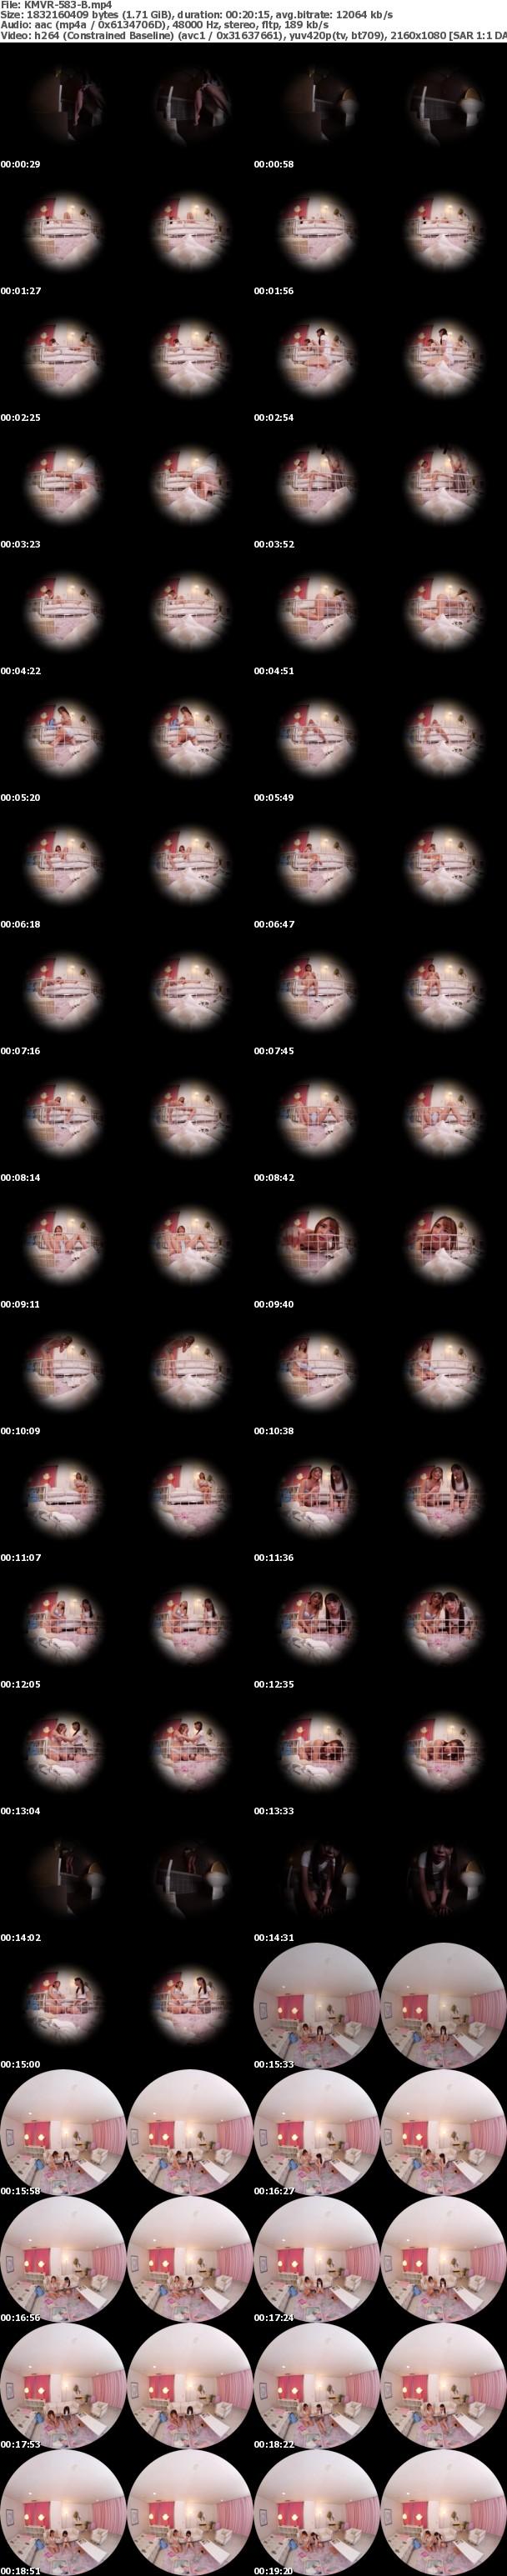 (VR) KVR1902-34 (KMVR-583) 寮に隠しカメラを仕掛けた盗撮犯を家に呼び出し、強制逆痴女3Pで犯すエロ過ぎ女子大生コンビ 花咲いあん あおいれな